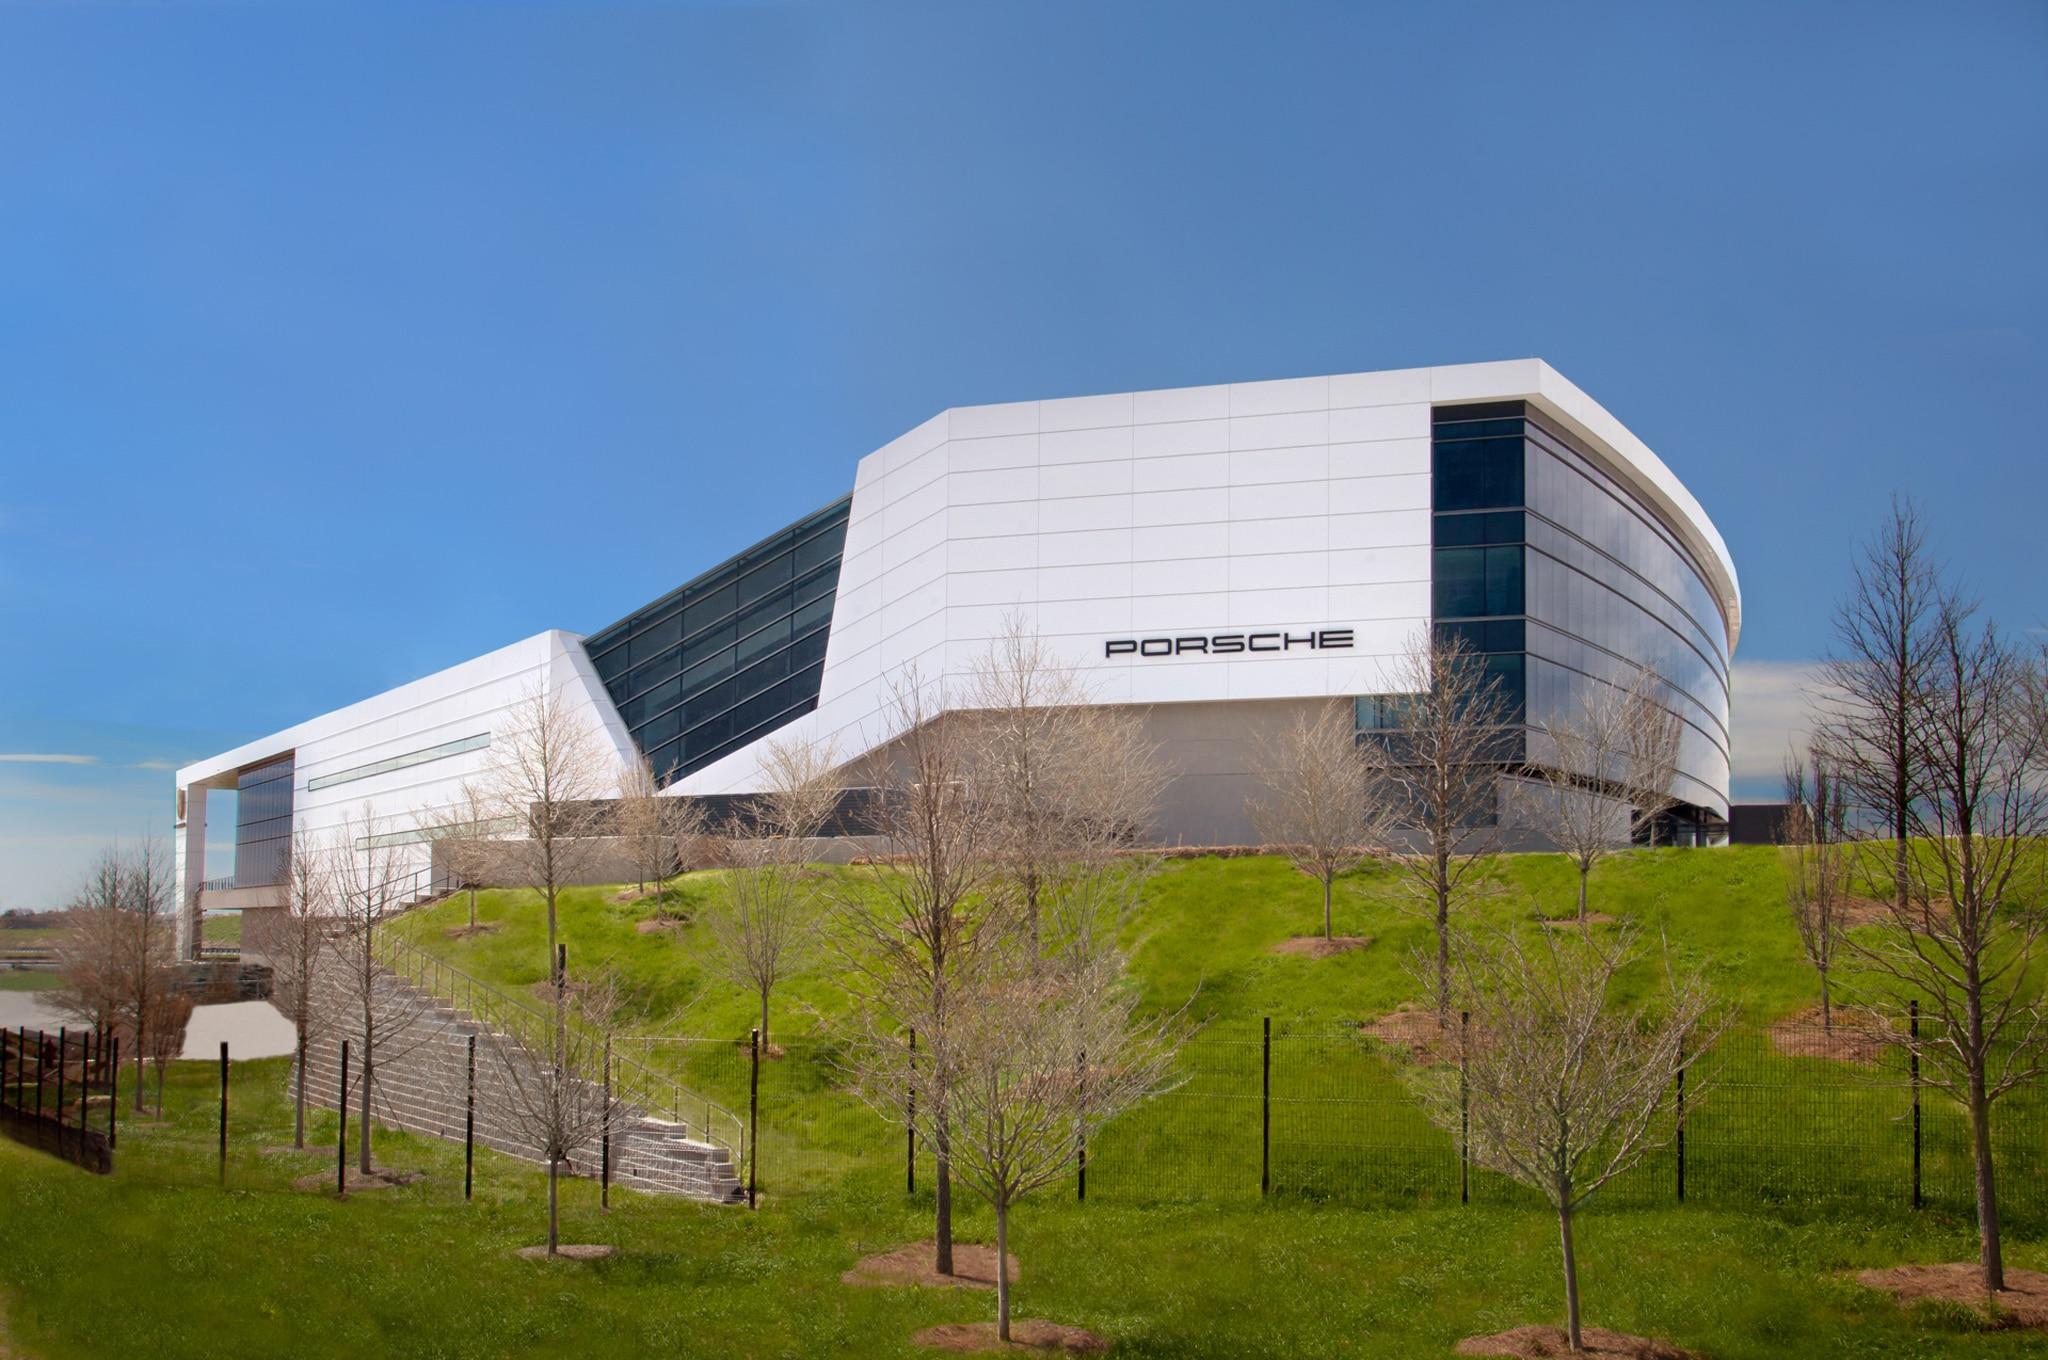 Porsche Headquarters Atlanta >> Porsche Opens New Headquarters, Test Track in Atlanta